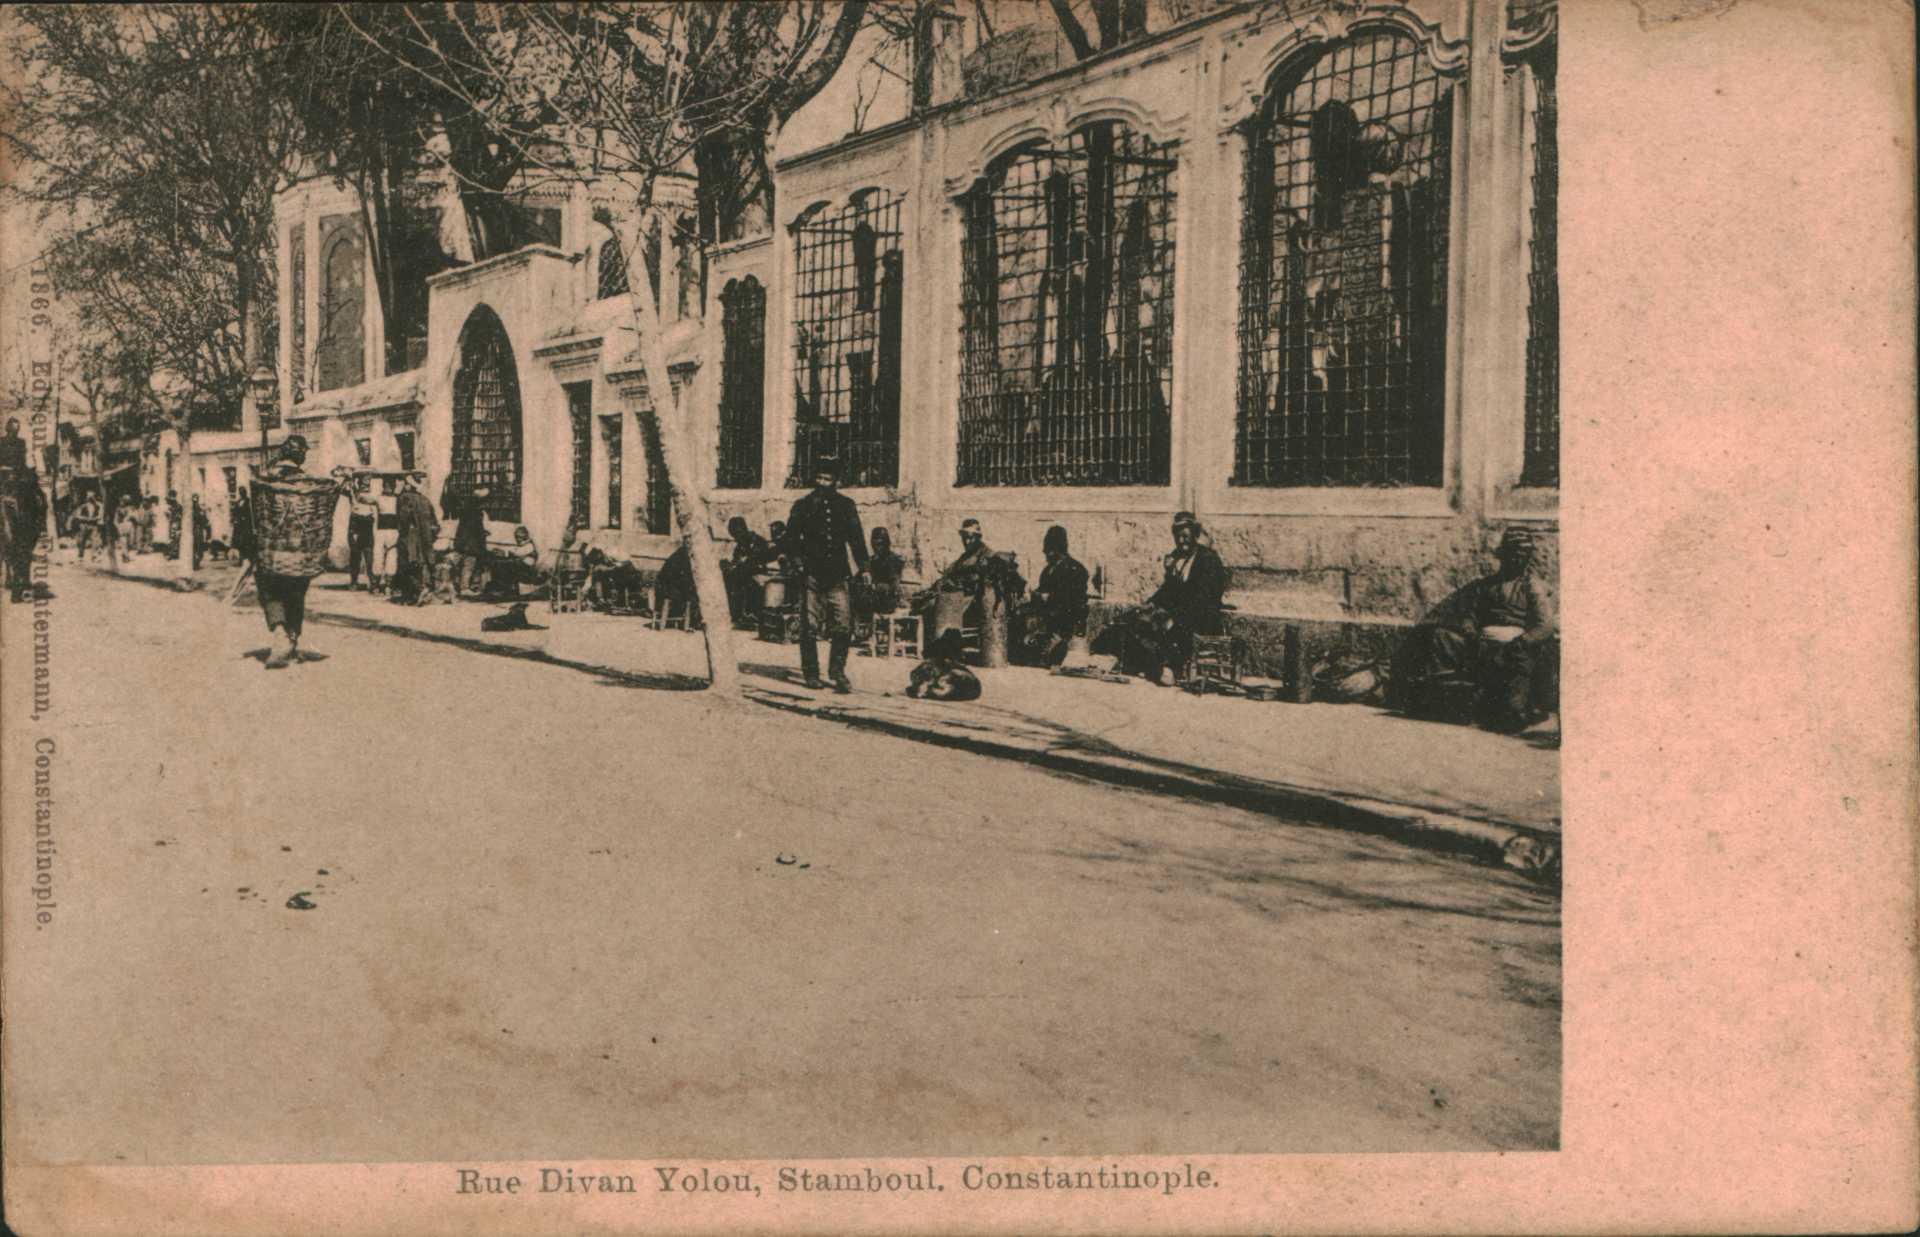 Rue Divan Yolou. Stamboul.Constantinople